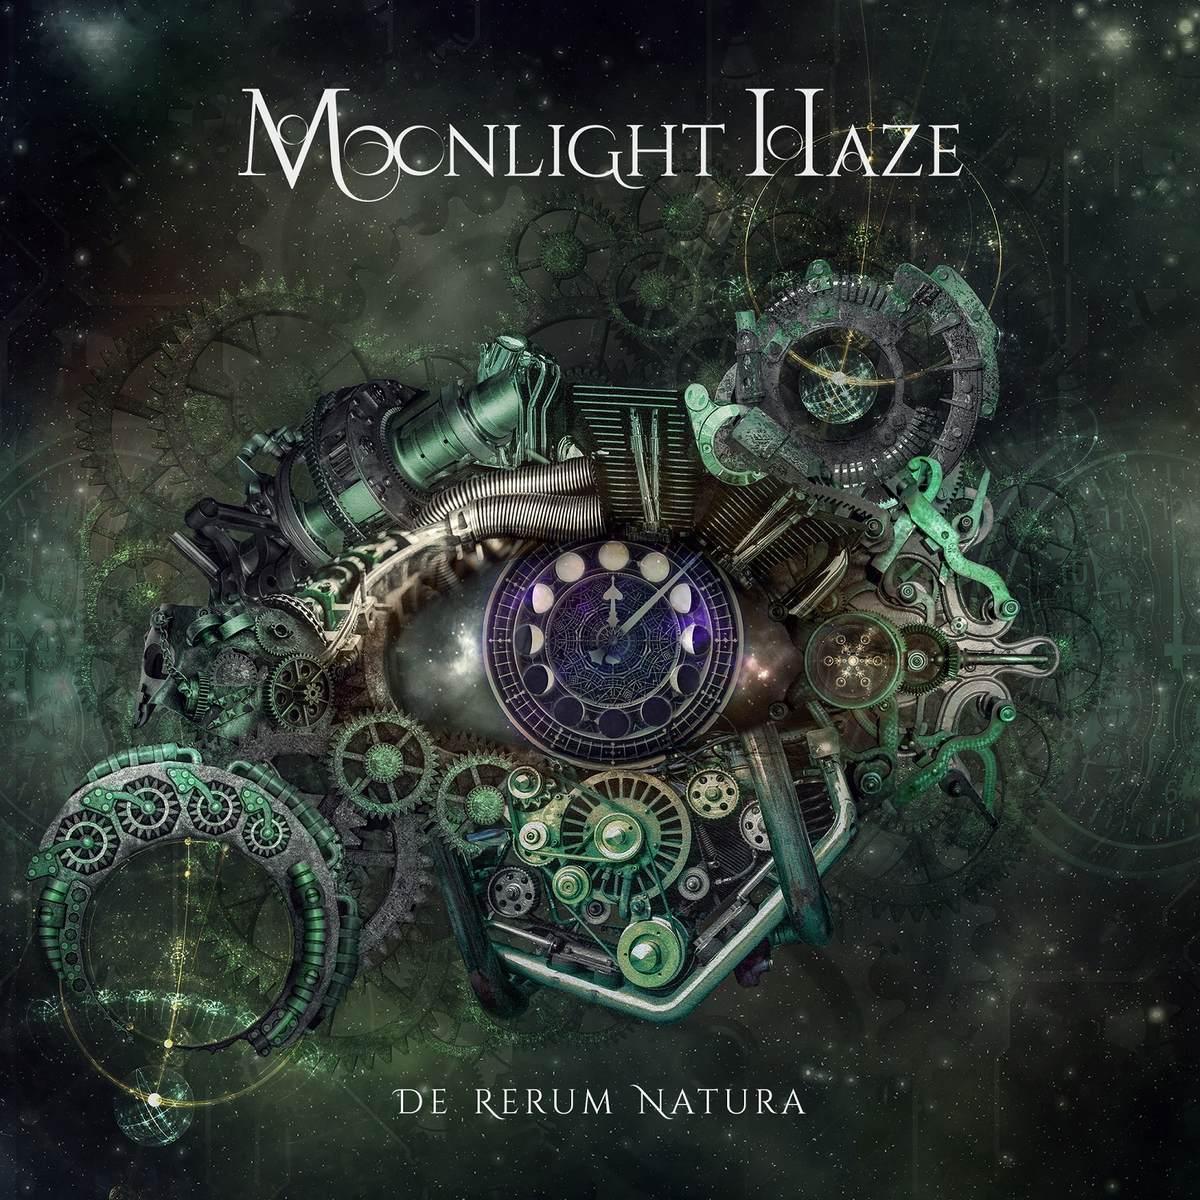 Moonlight Haze - De Rerum Natura